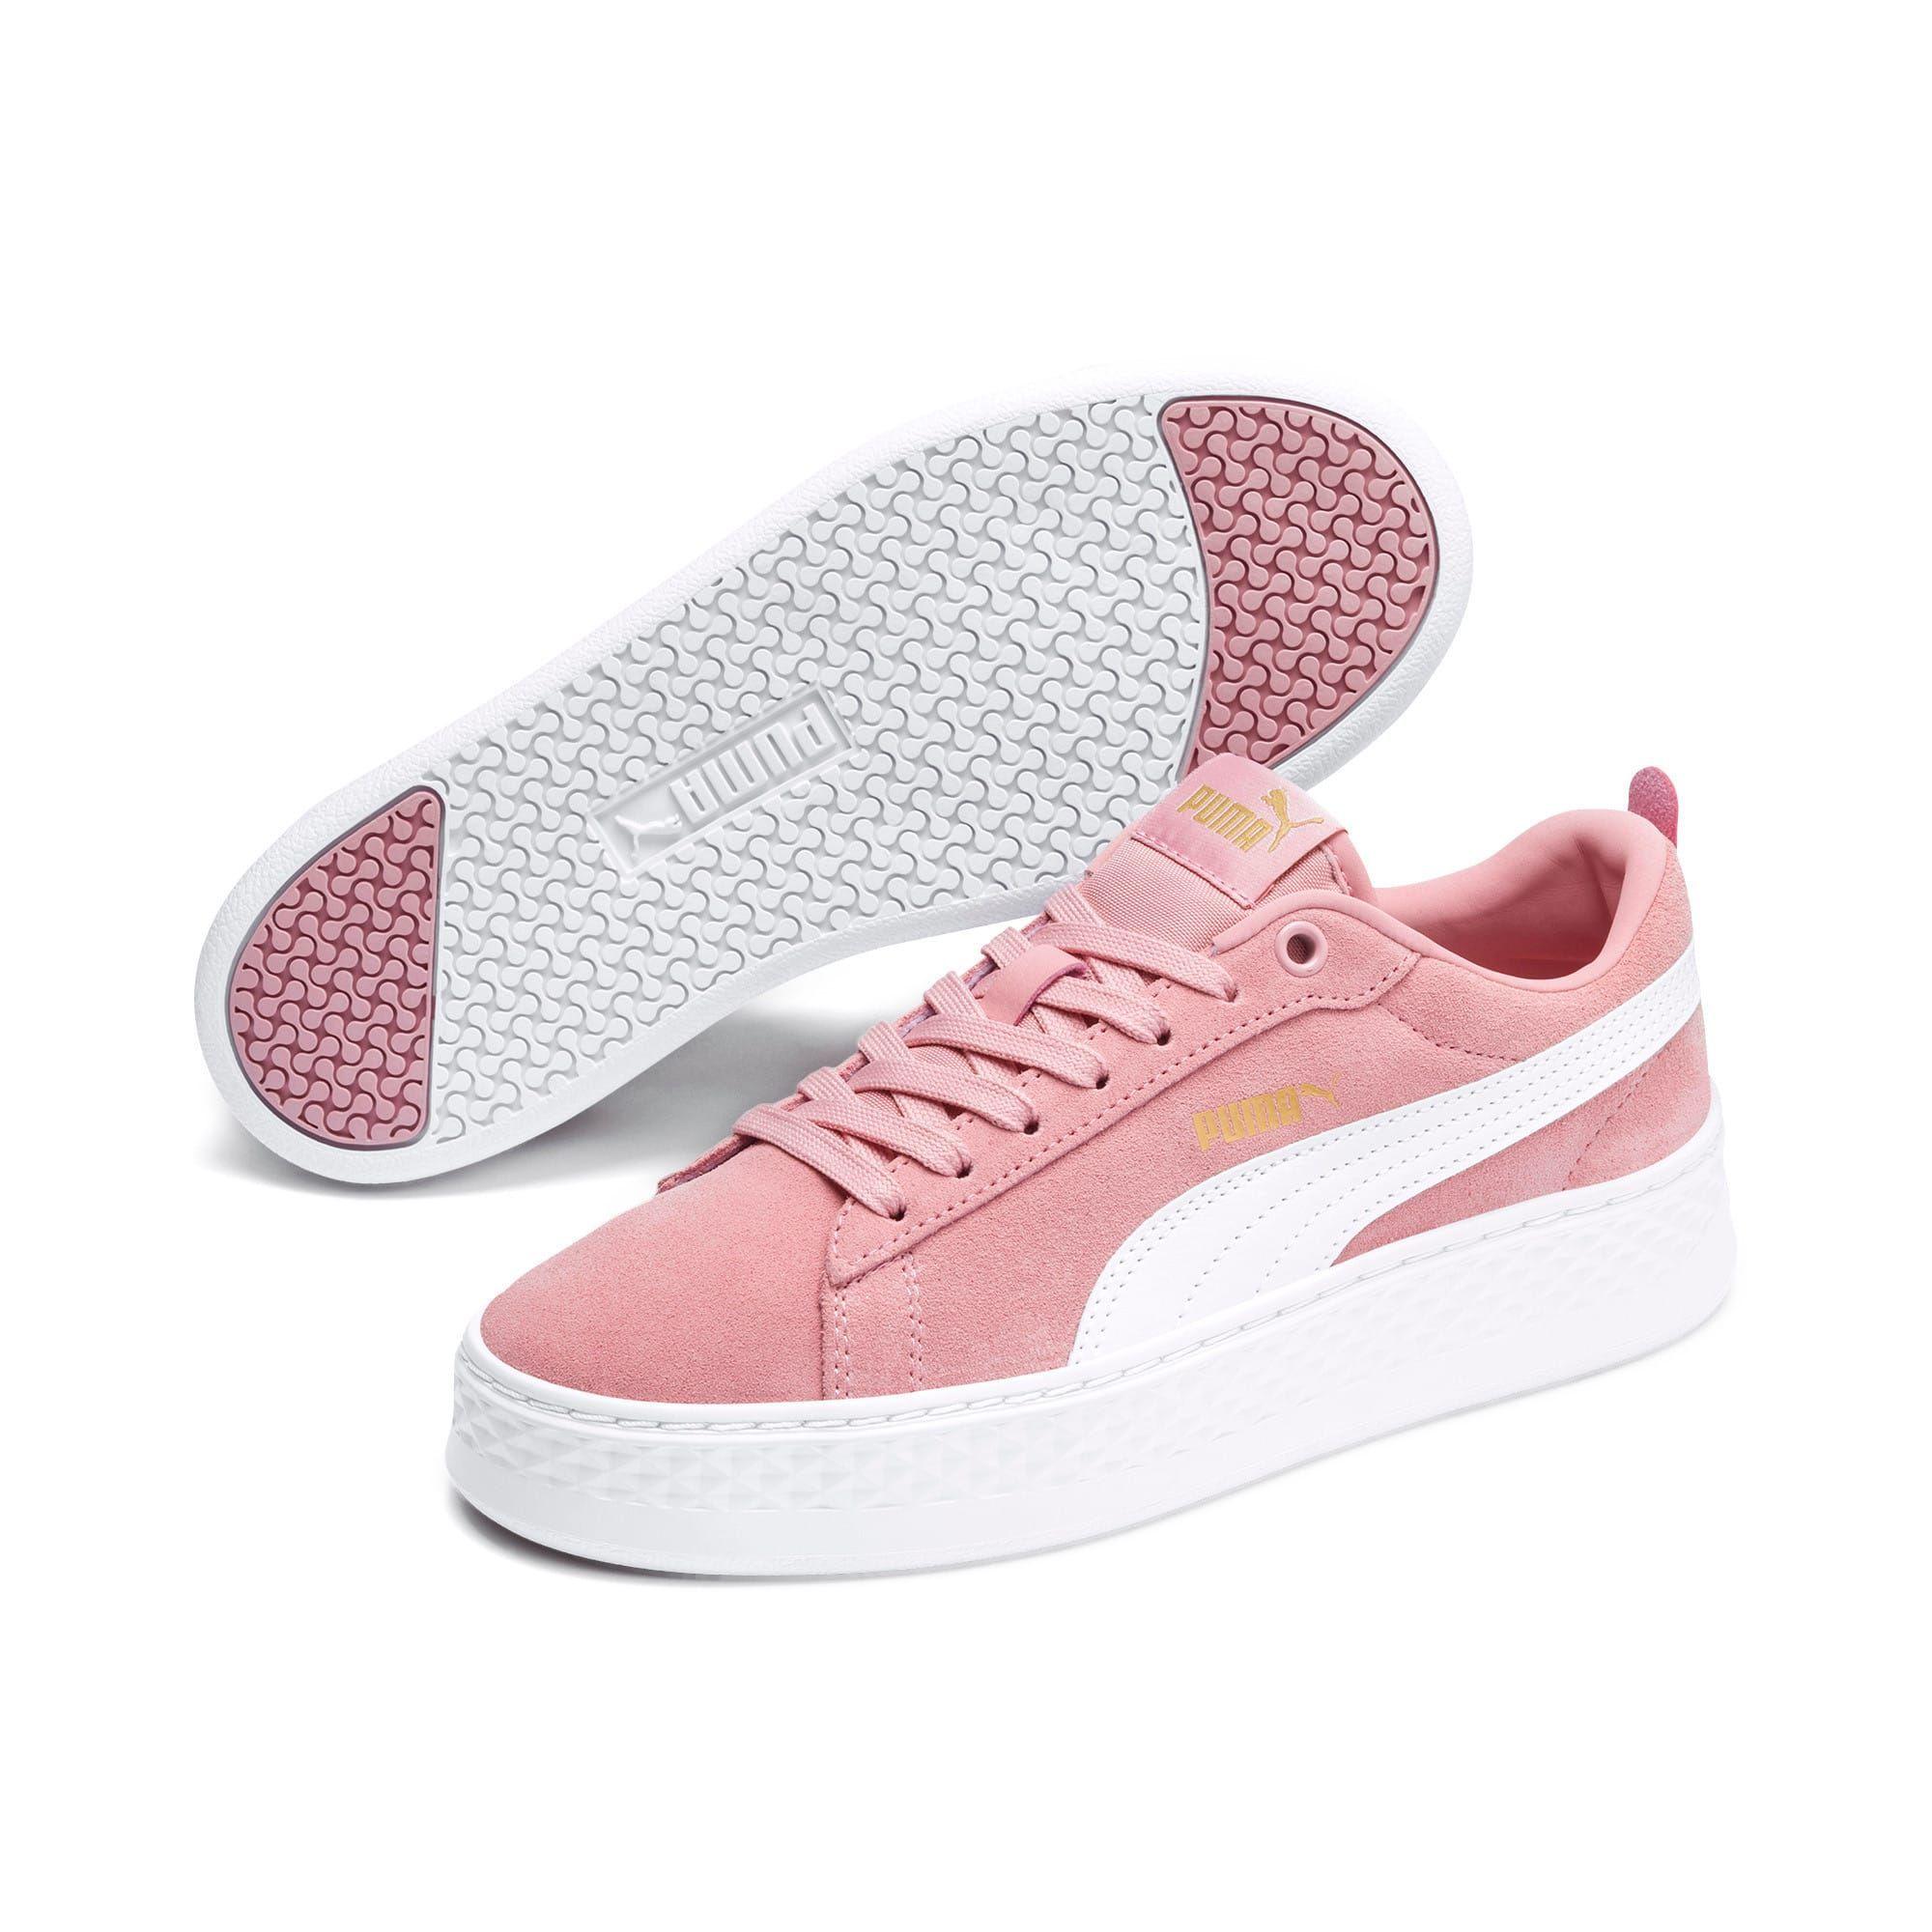 maratón Pelágico violencia  PUMA Smash Platform Suede Women's Trainers in Bridal Rose/White/Gold size  6.5 #bridal #platform #sma… | Puma shoes women, Pink puma sneakers, Casual  sneakers women